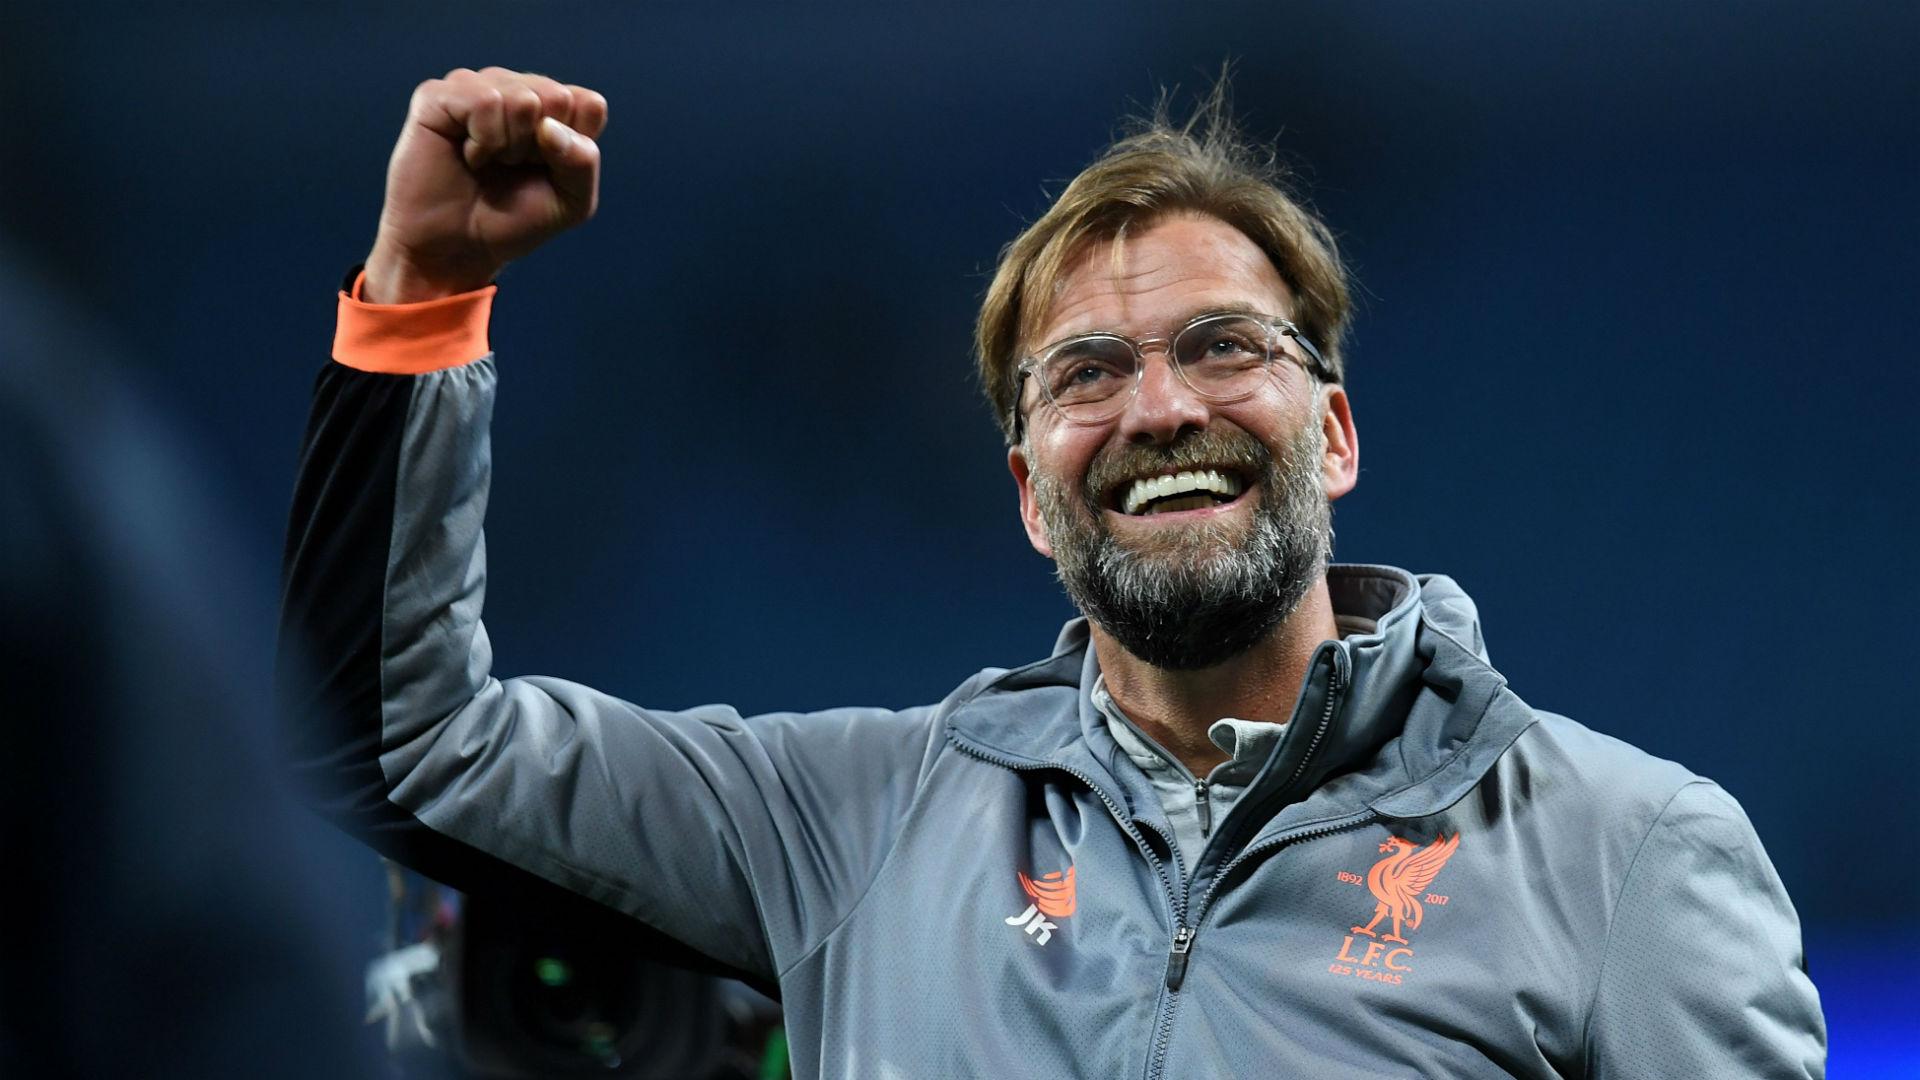 Liverpool close to matching Man Utd &City depth with Fabinho &Fekir deals, claims Murphy